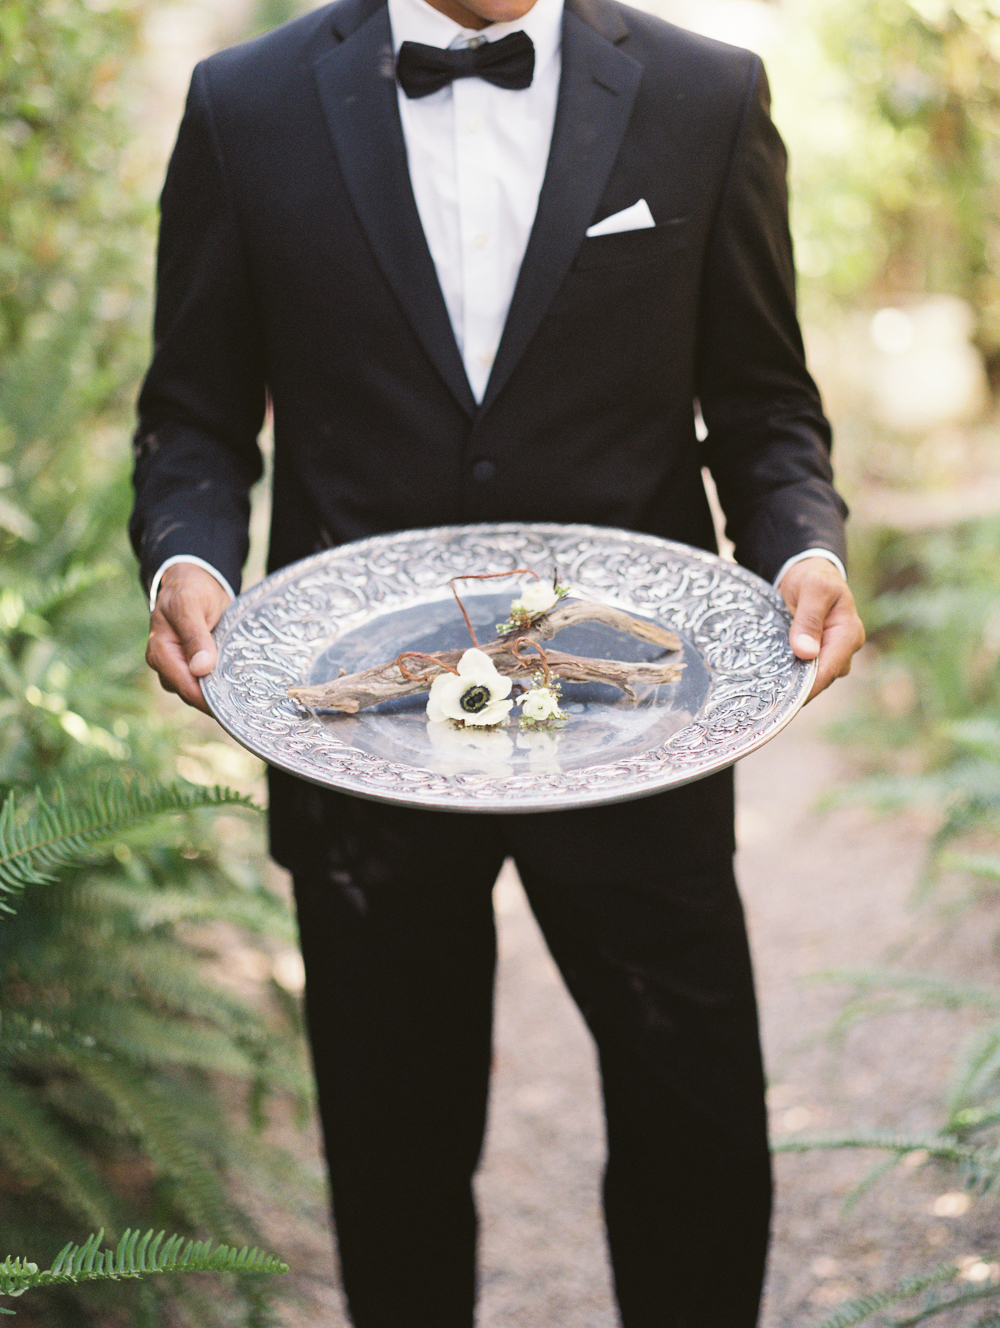 ORANGE-COUNTY-FOLLY-ESTATE-WEDDING-PHOTOGRAPHY-0066.jpg